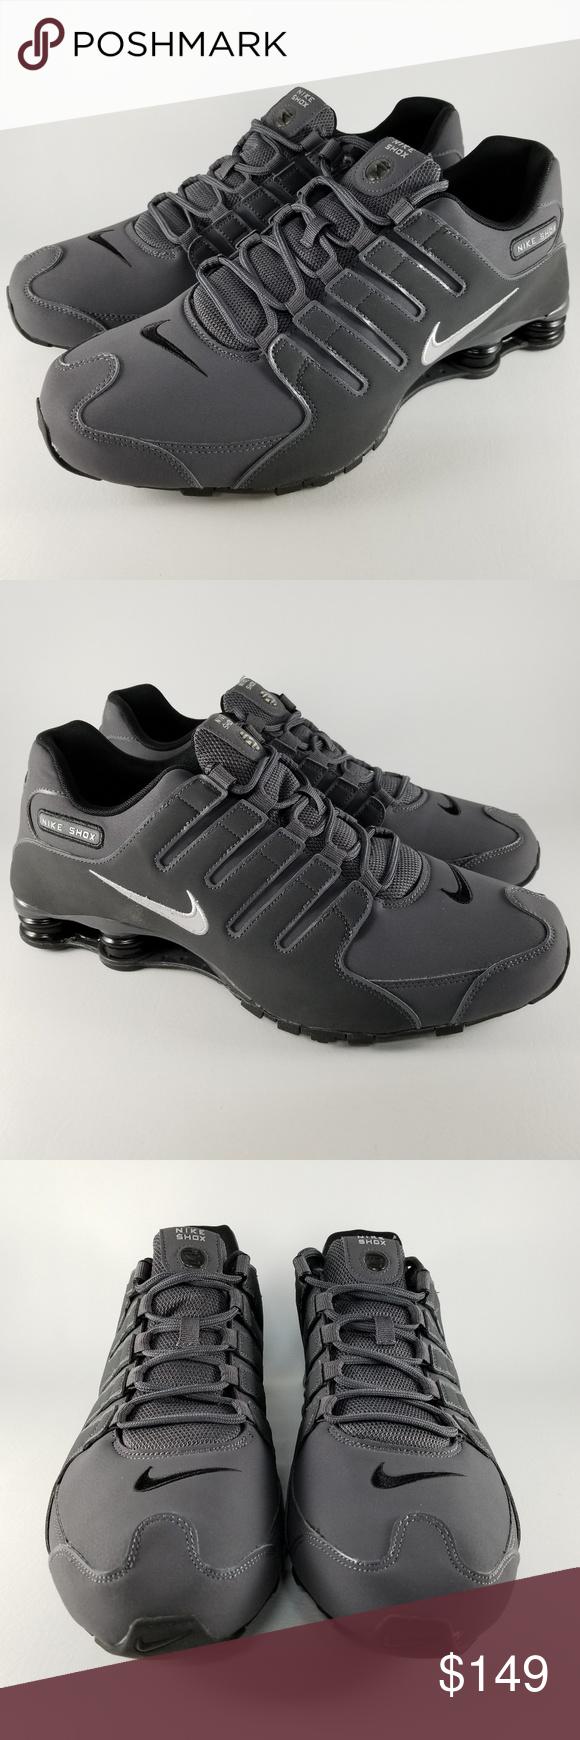 brand new 87e0a ea40b Nike Shox NZ Men s Running Athletic Shoes Grey 15 Nike Shox NZ Men s  Running Shoes Style